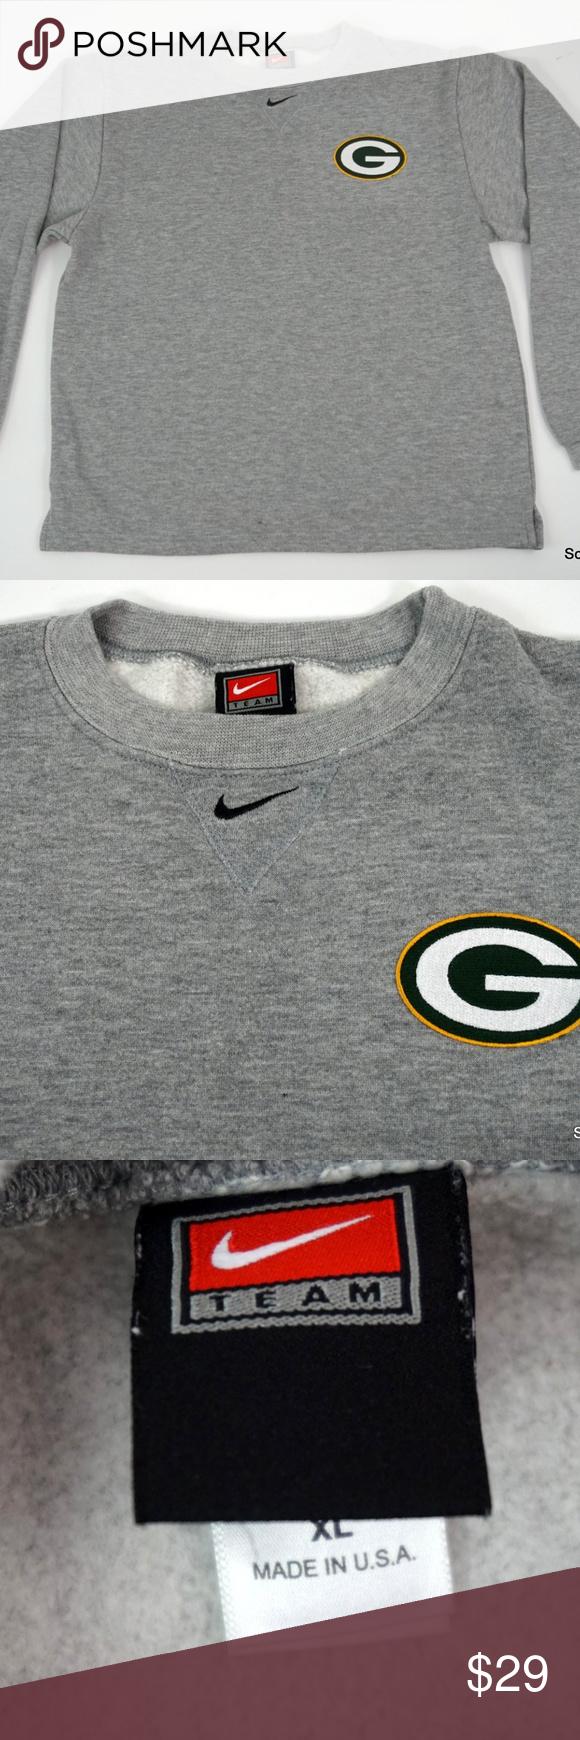 Vtg Boys Nike Green Bay Packers Sweatshirt Xl Green Bay Packers Sweatshirt Sweatshirts Packers Sweatshirt [ 1740 x 580 Pixel ]